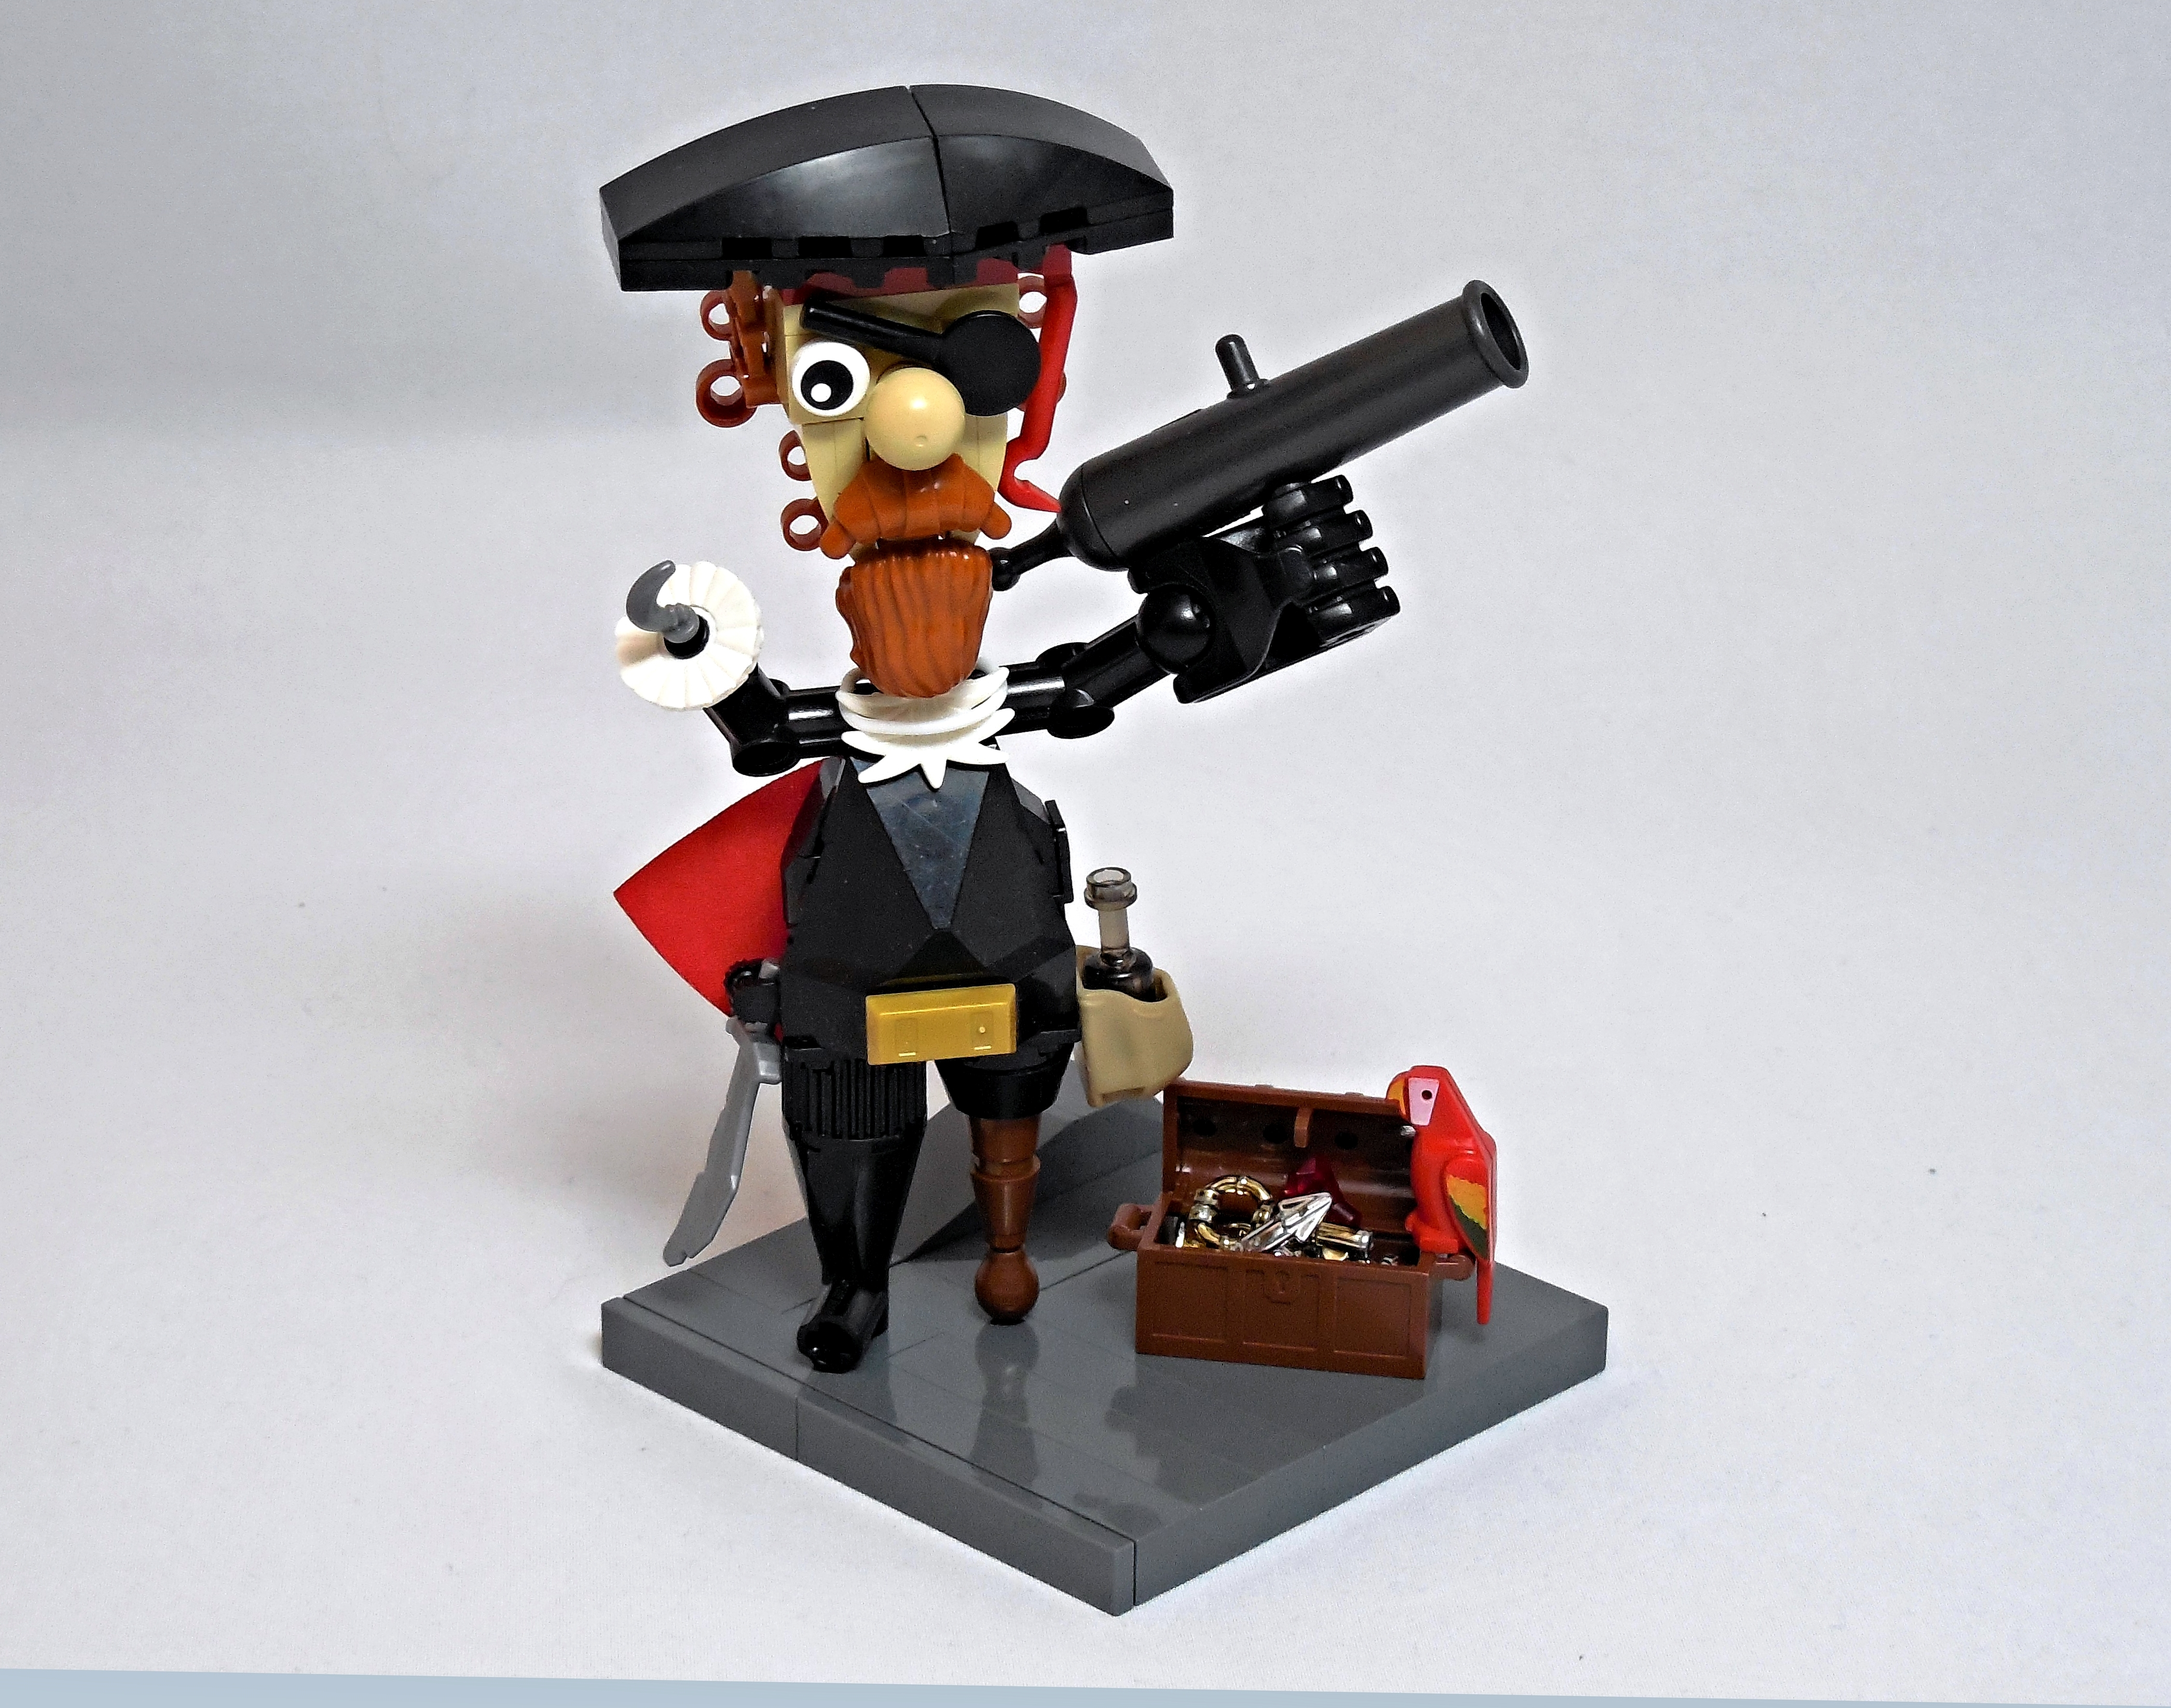 LEGO® MOC by Vitreolum: Stumpy McHook